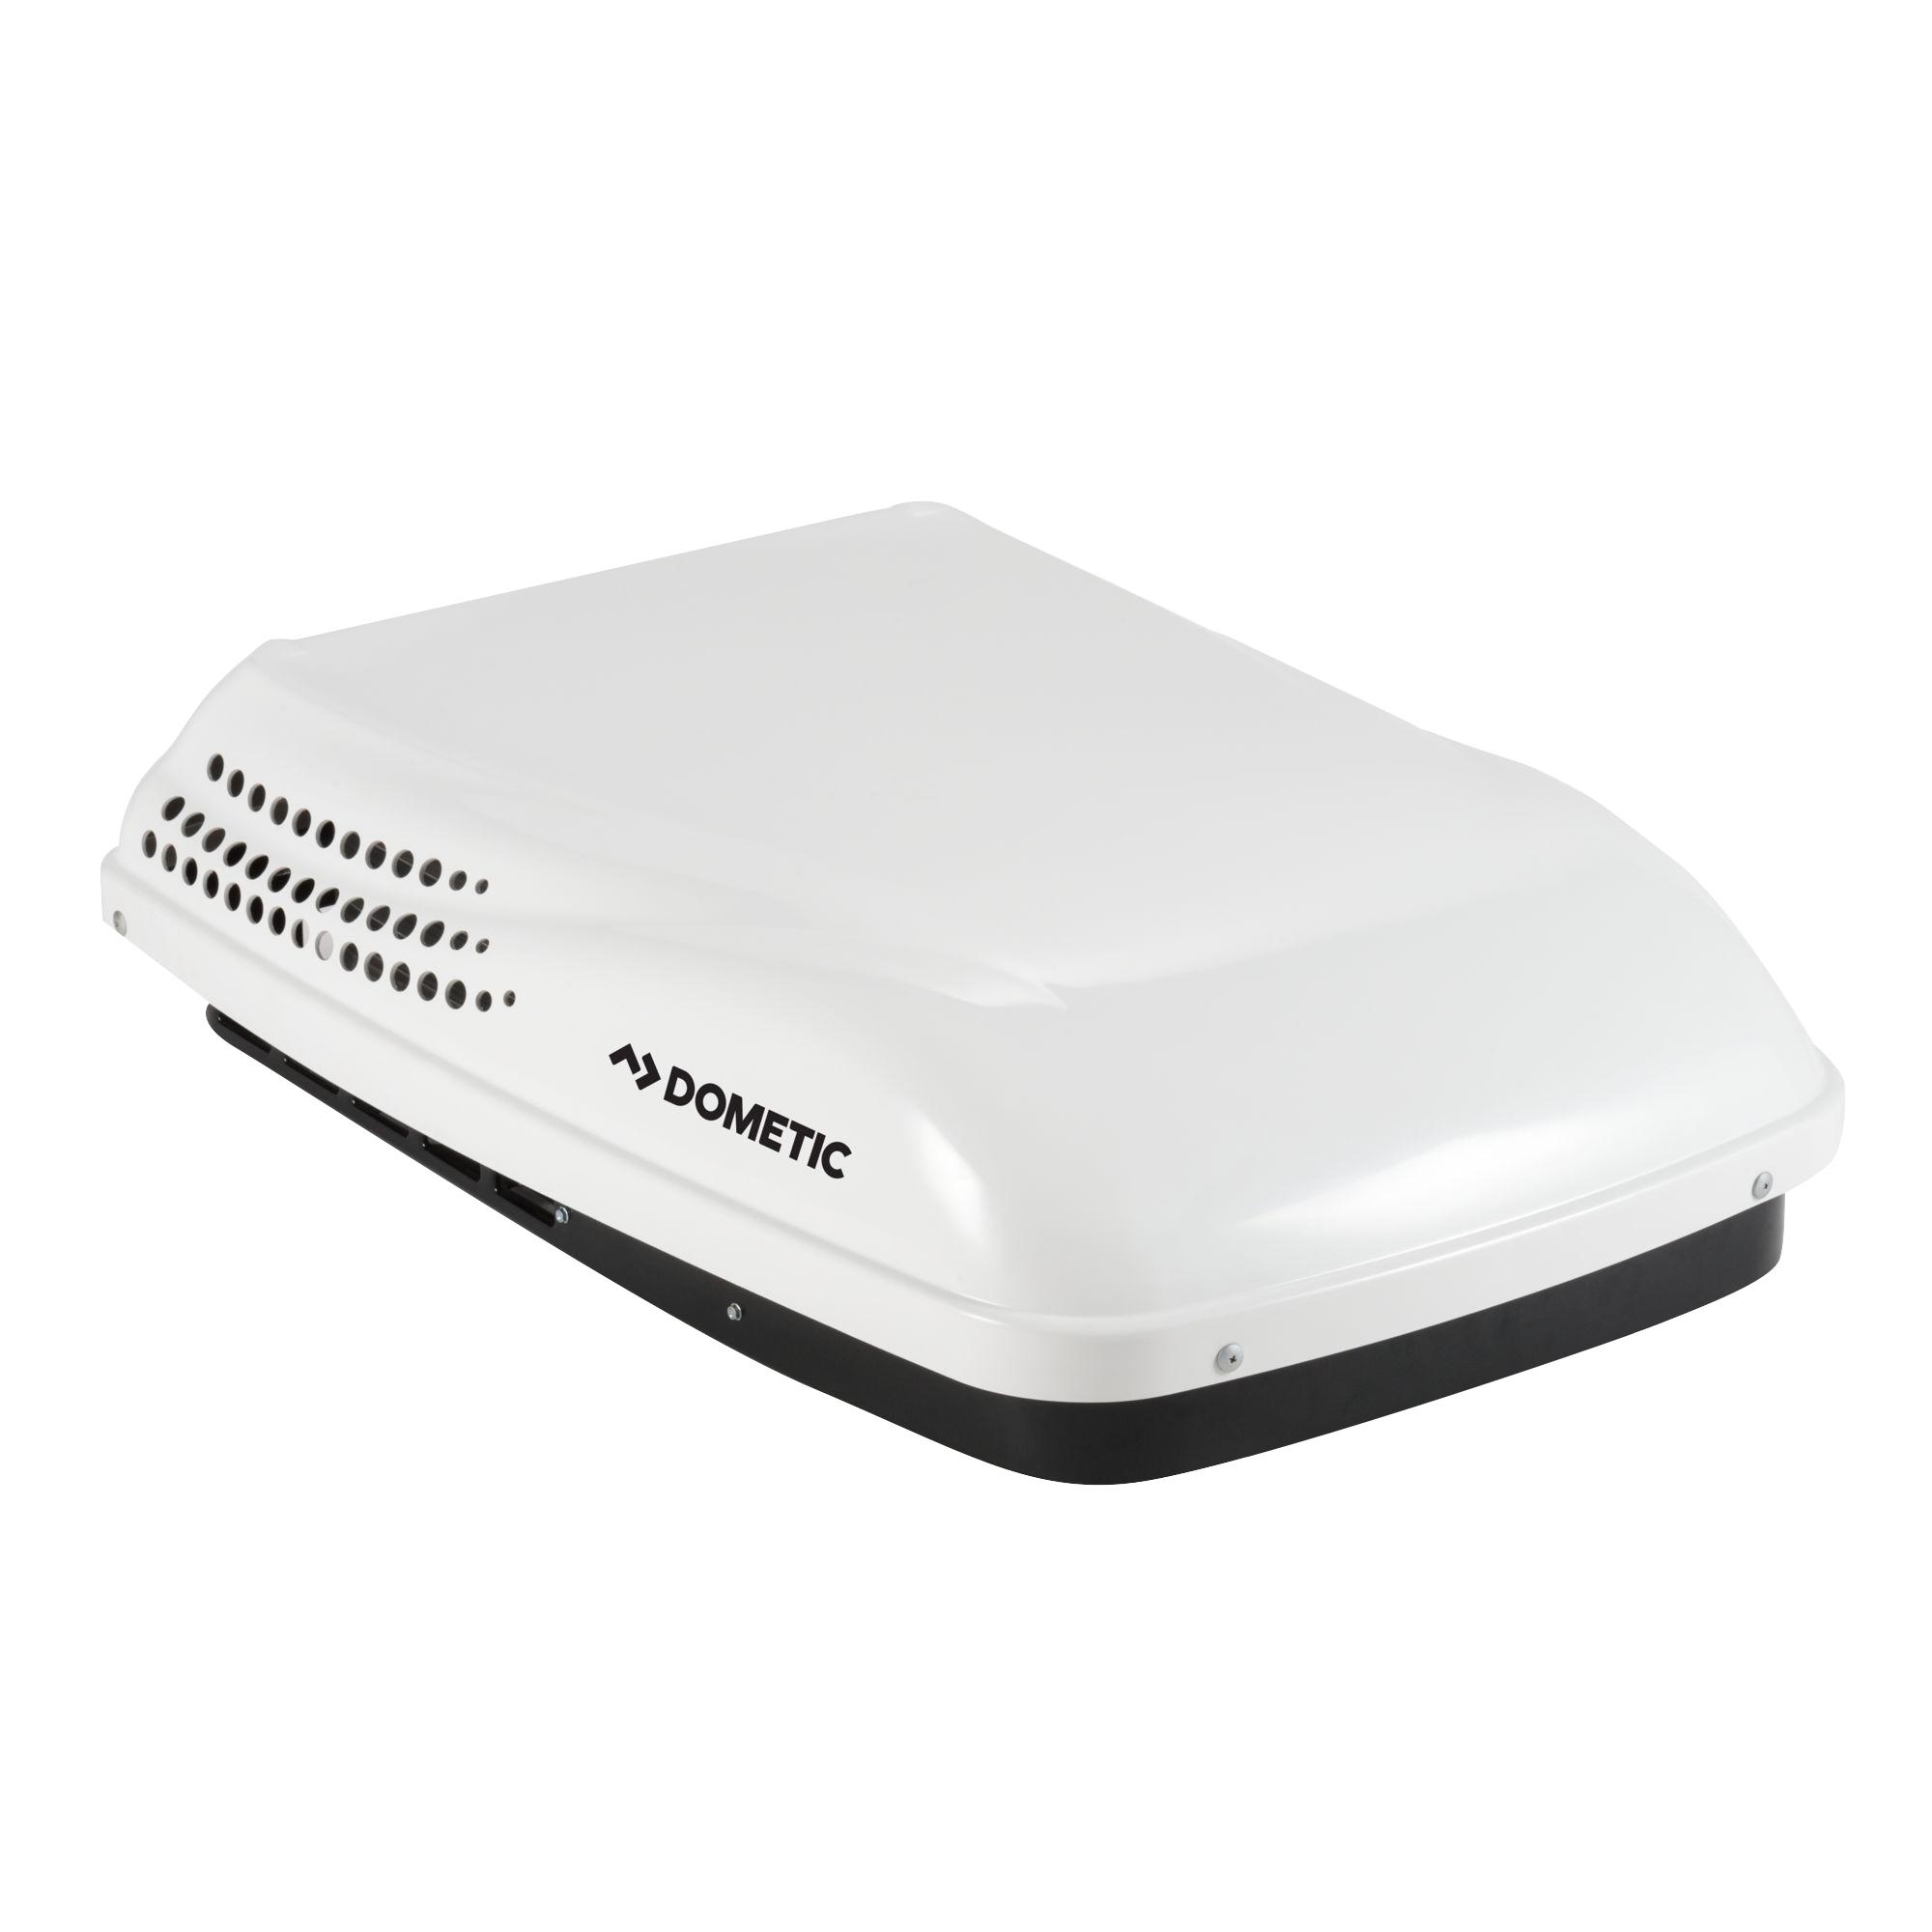 Dometic Penguin II Air Conditioner with Heat Pump, 15K BTU, Polar White -  651816HXX1C0-01